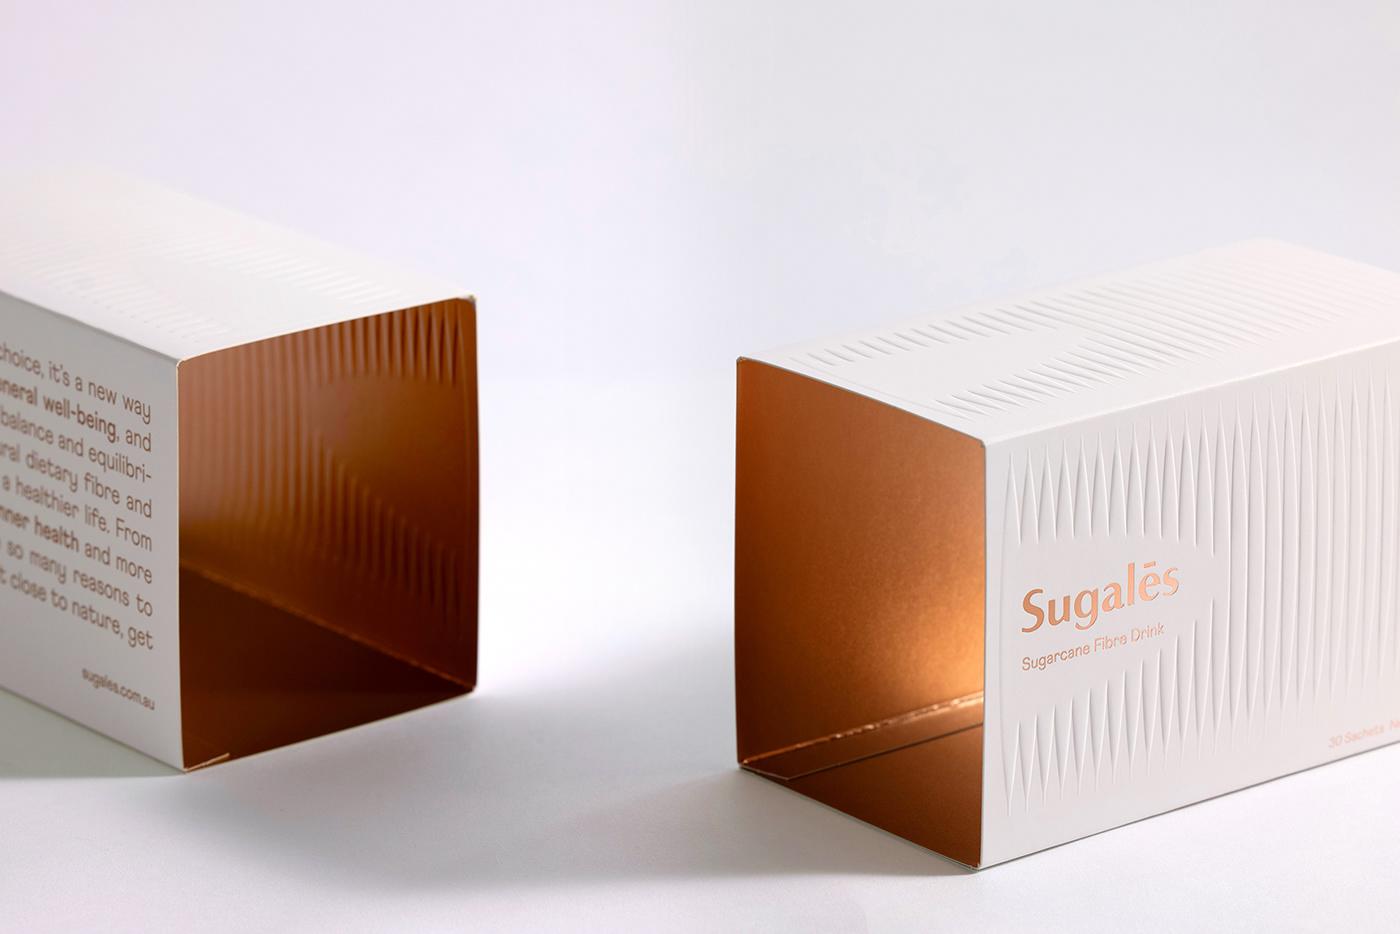 Image may contain: box and minimalist